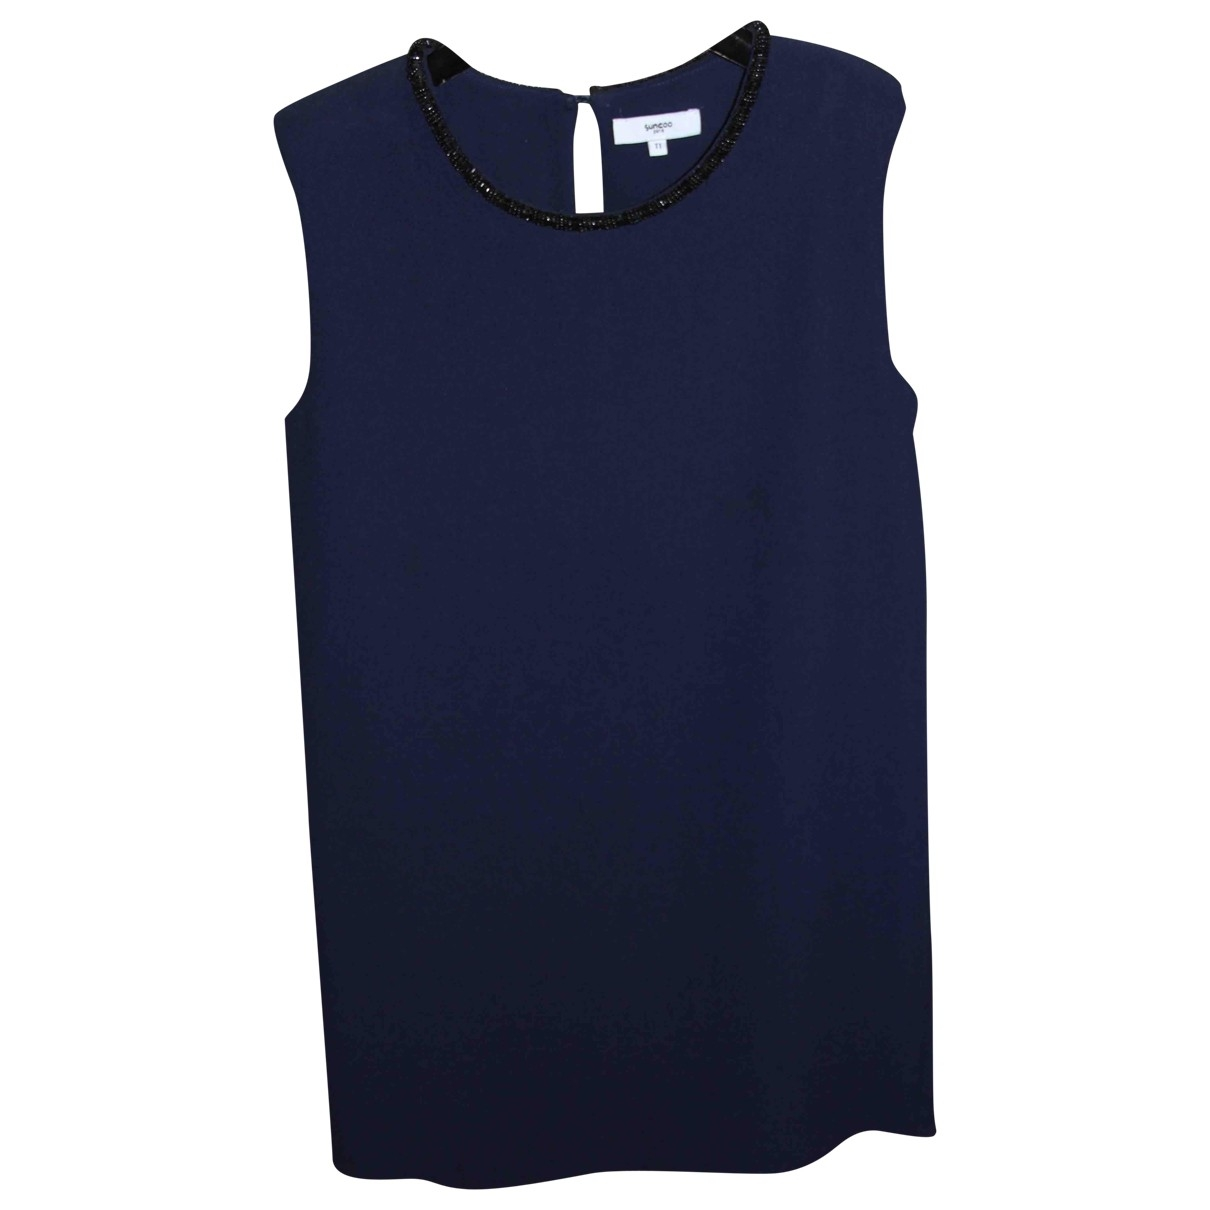 Suncoo \N Navy dress for Women 36 FR